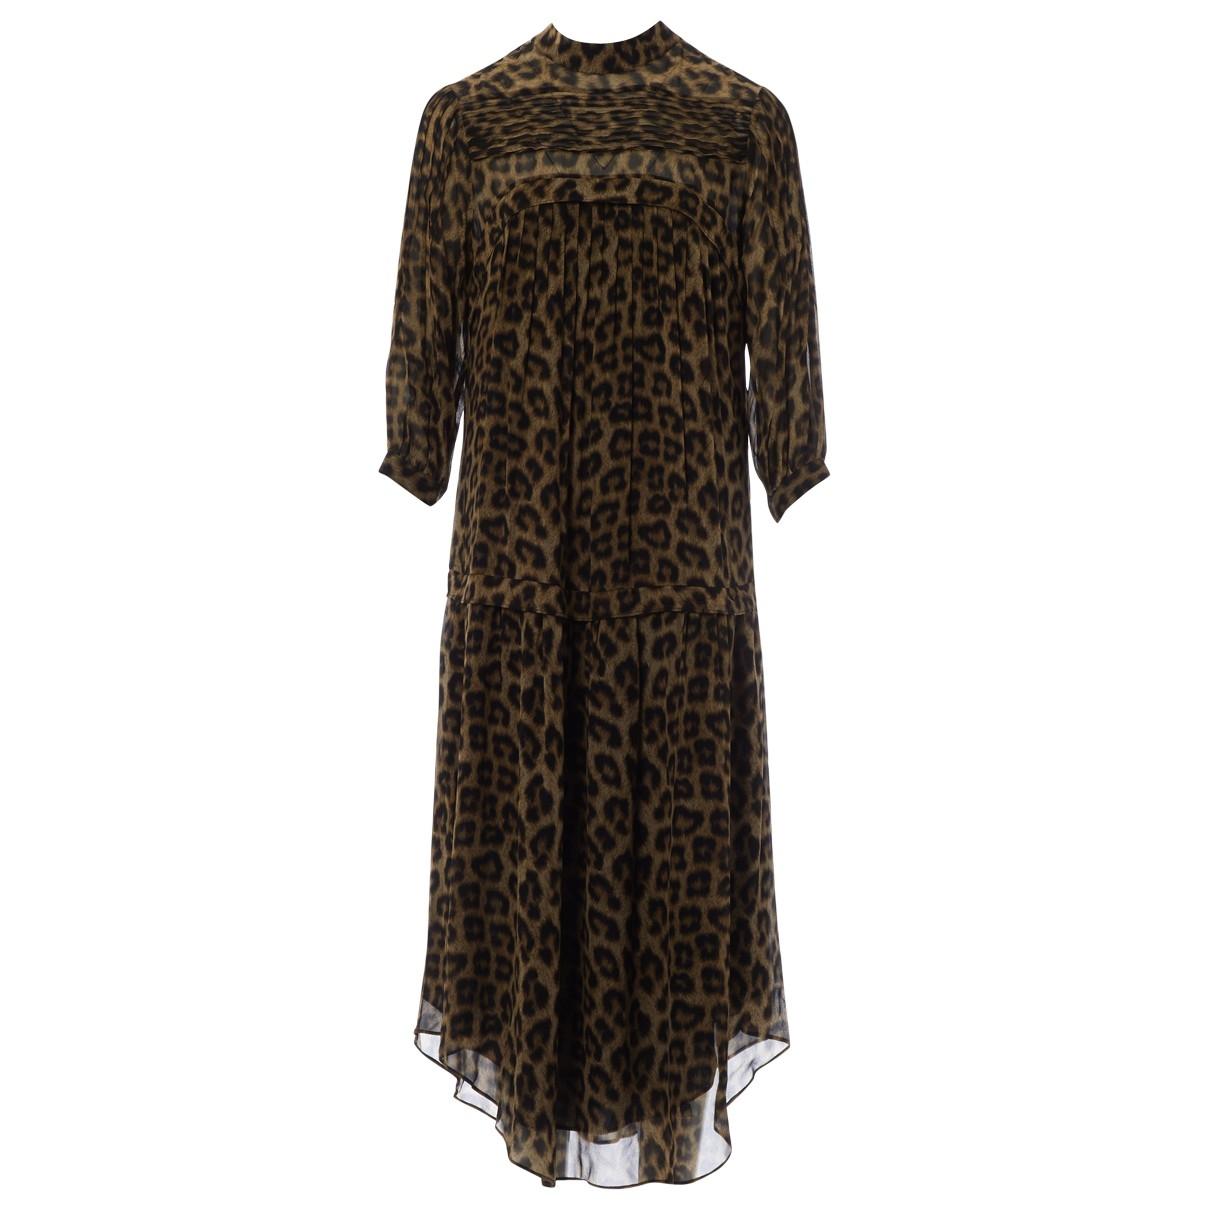 Ba&sh X Vestiaire Collective Fiona Brown dress for Women 0 0-5